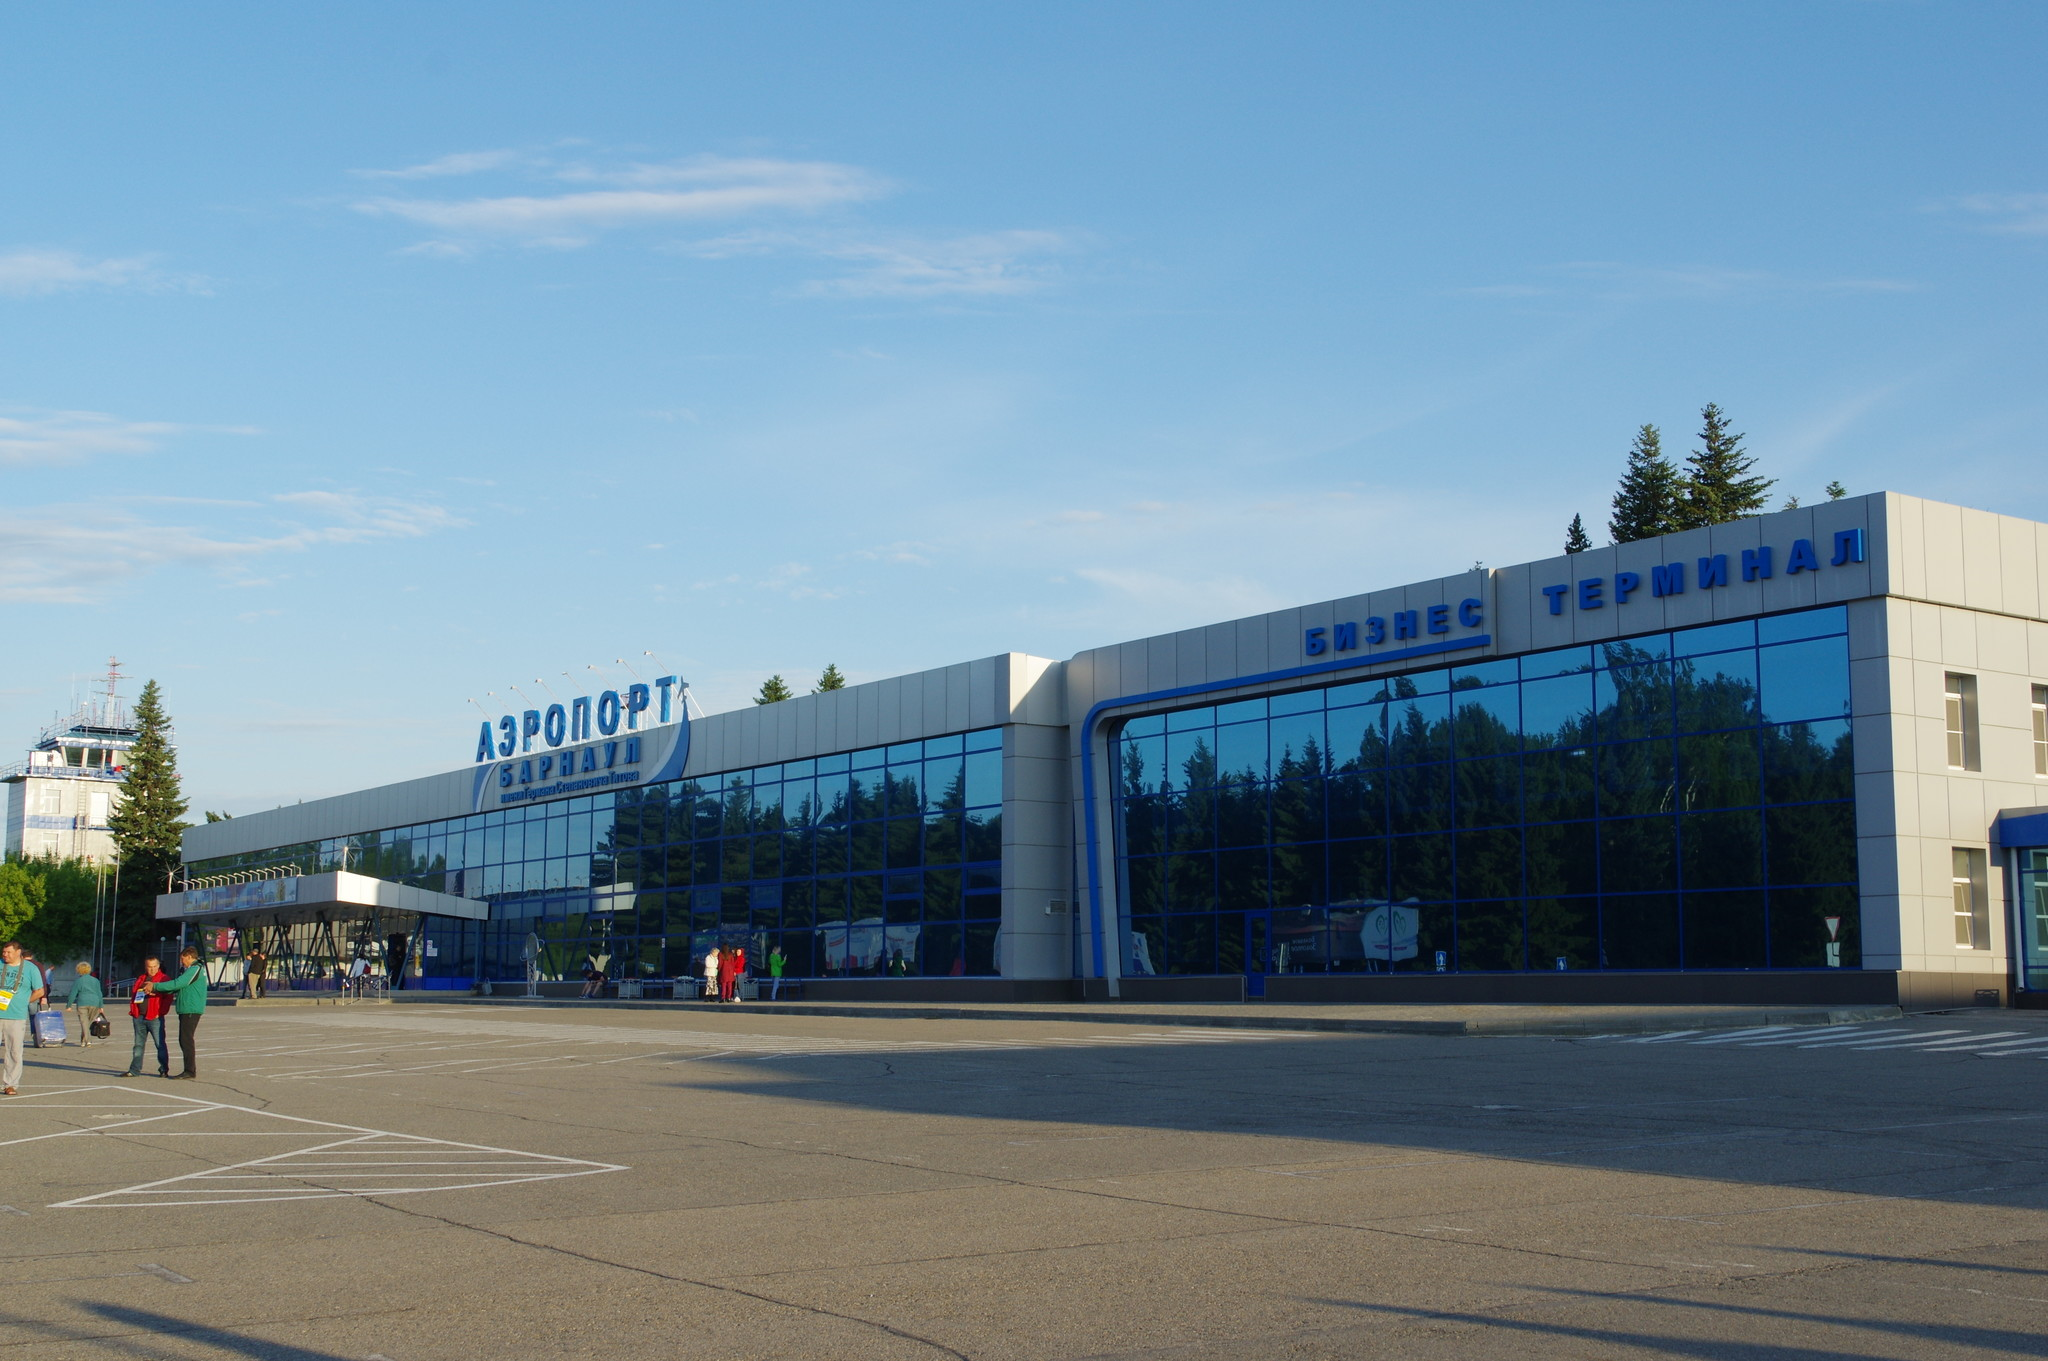 Международный аэропорт Барнаул имени Германа Степановича Титова